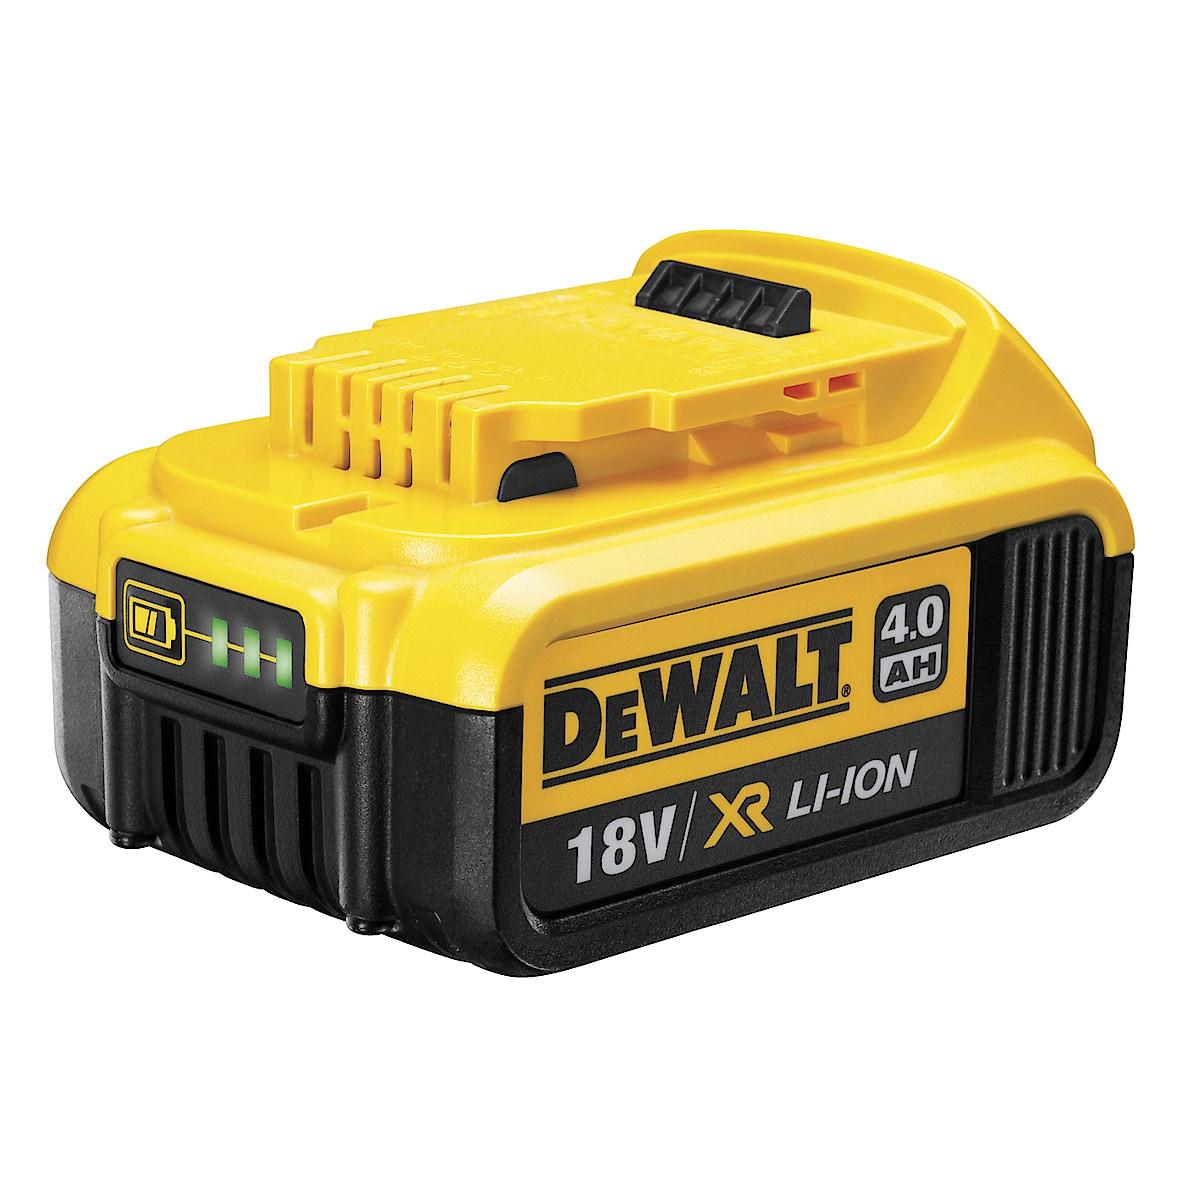 Dewalt XR DCB182 batteri